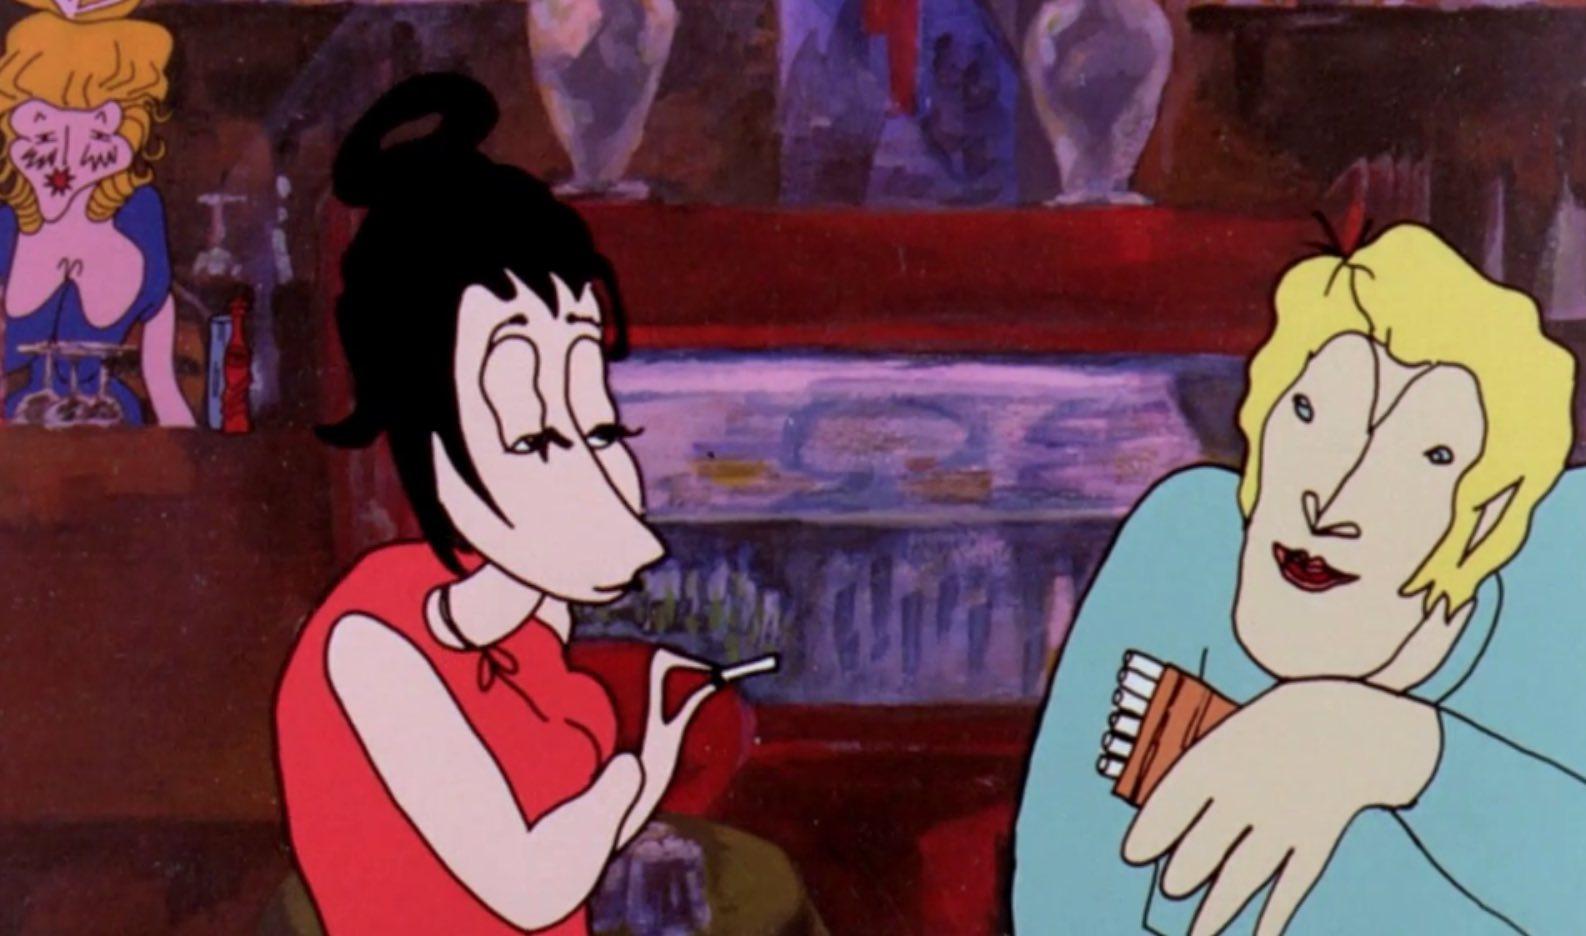 Gyorgy Kovasznai's Nights in the Boulevard Ruben Brandt animation Hungarian